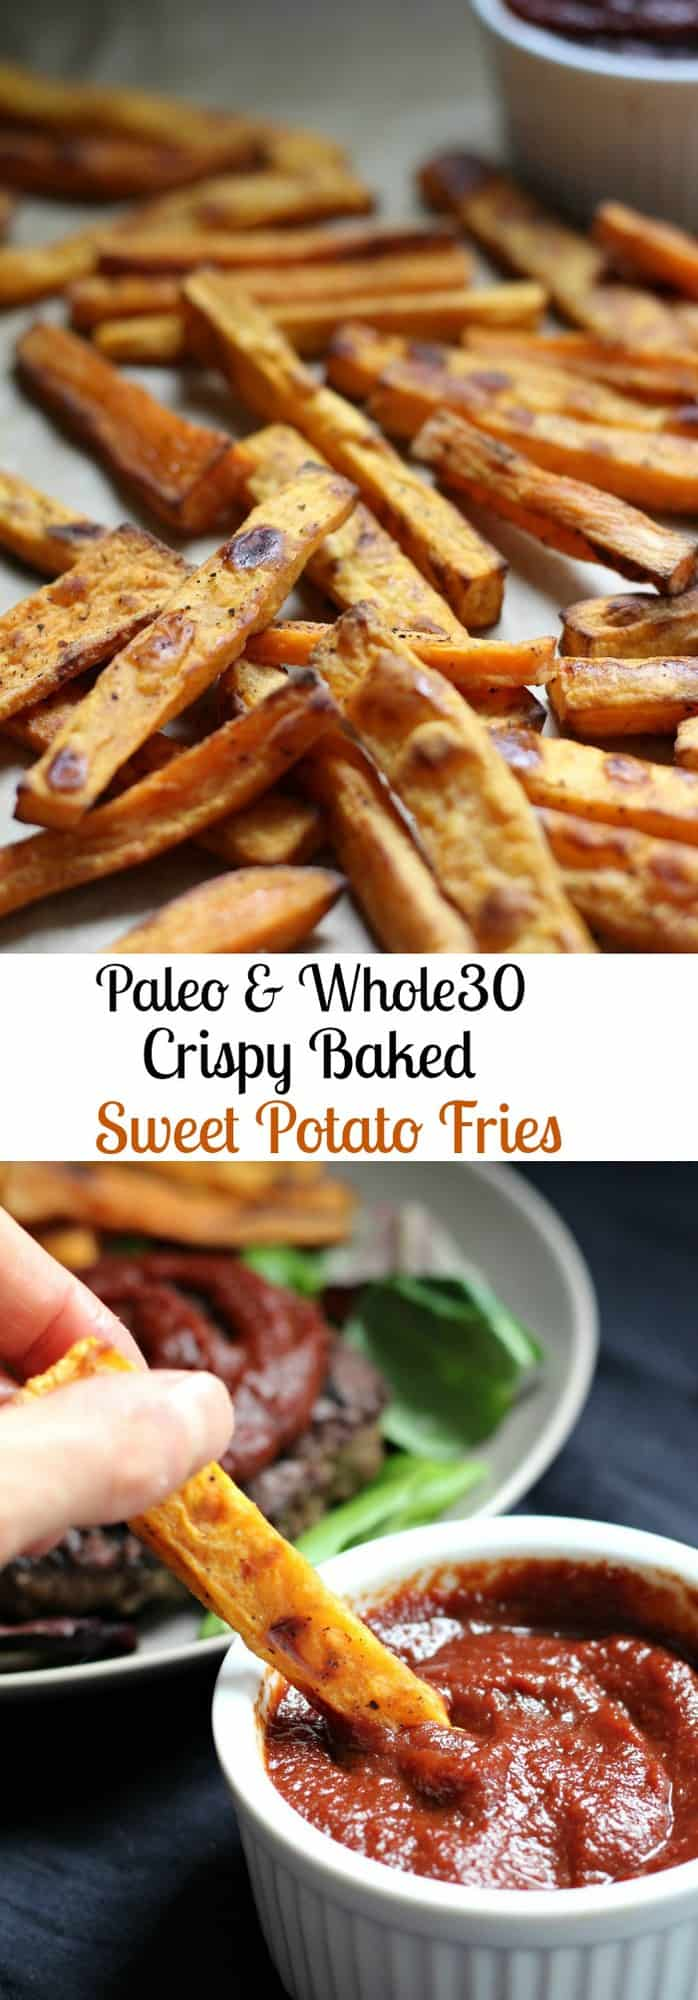 how to make whole30 sweet potato fries